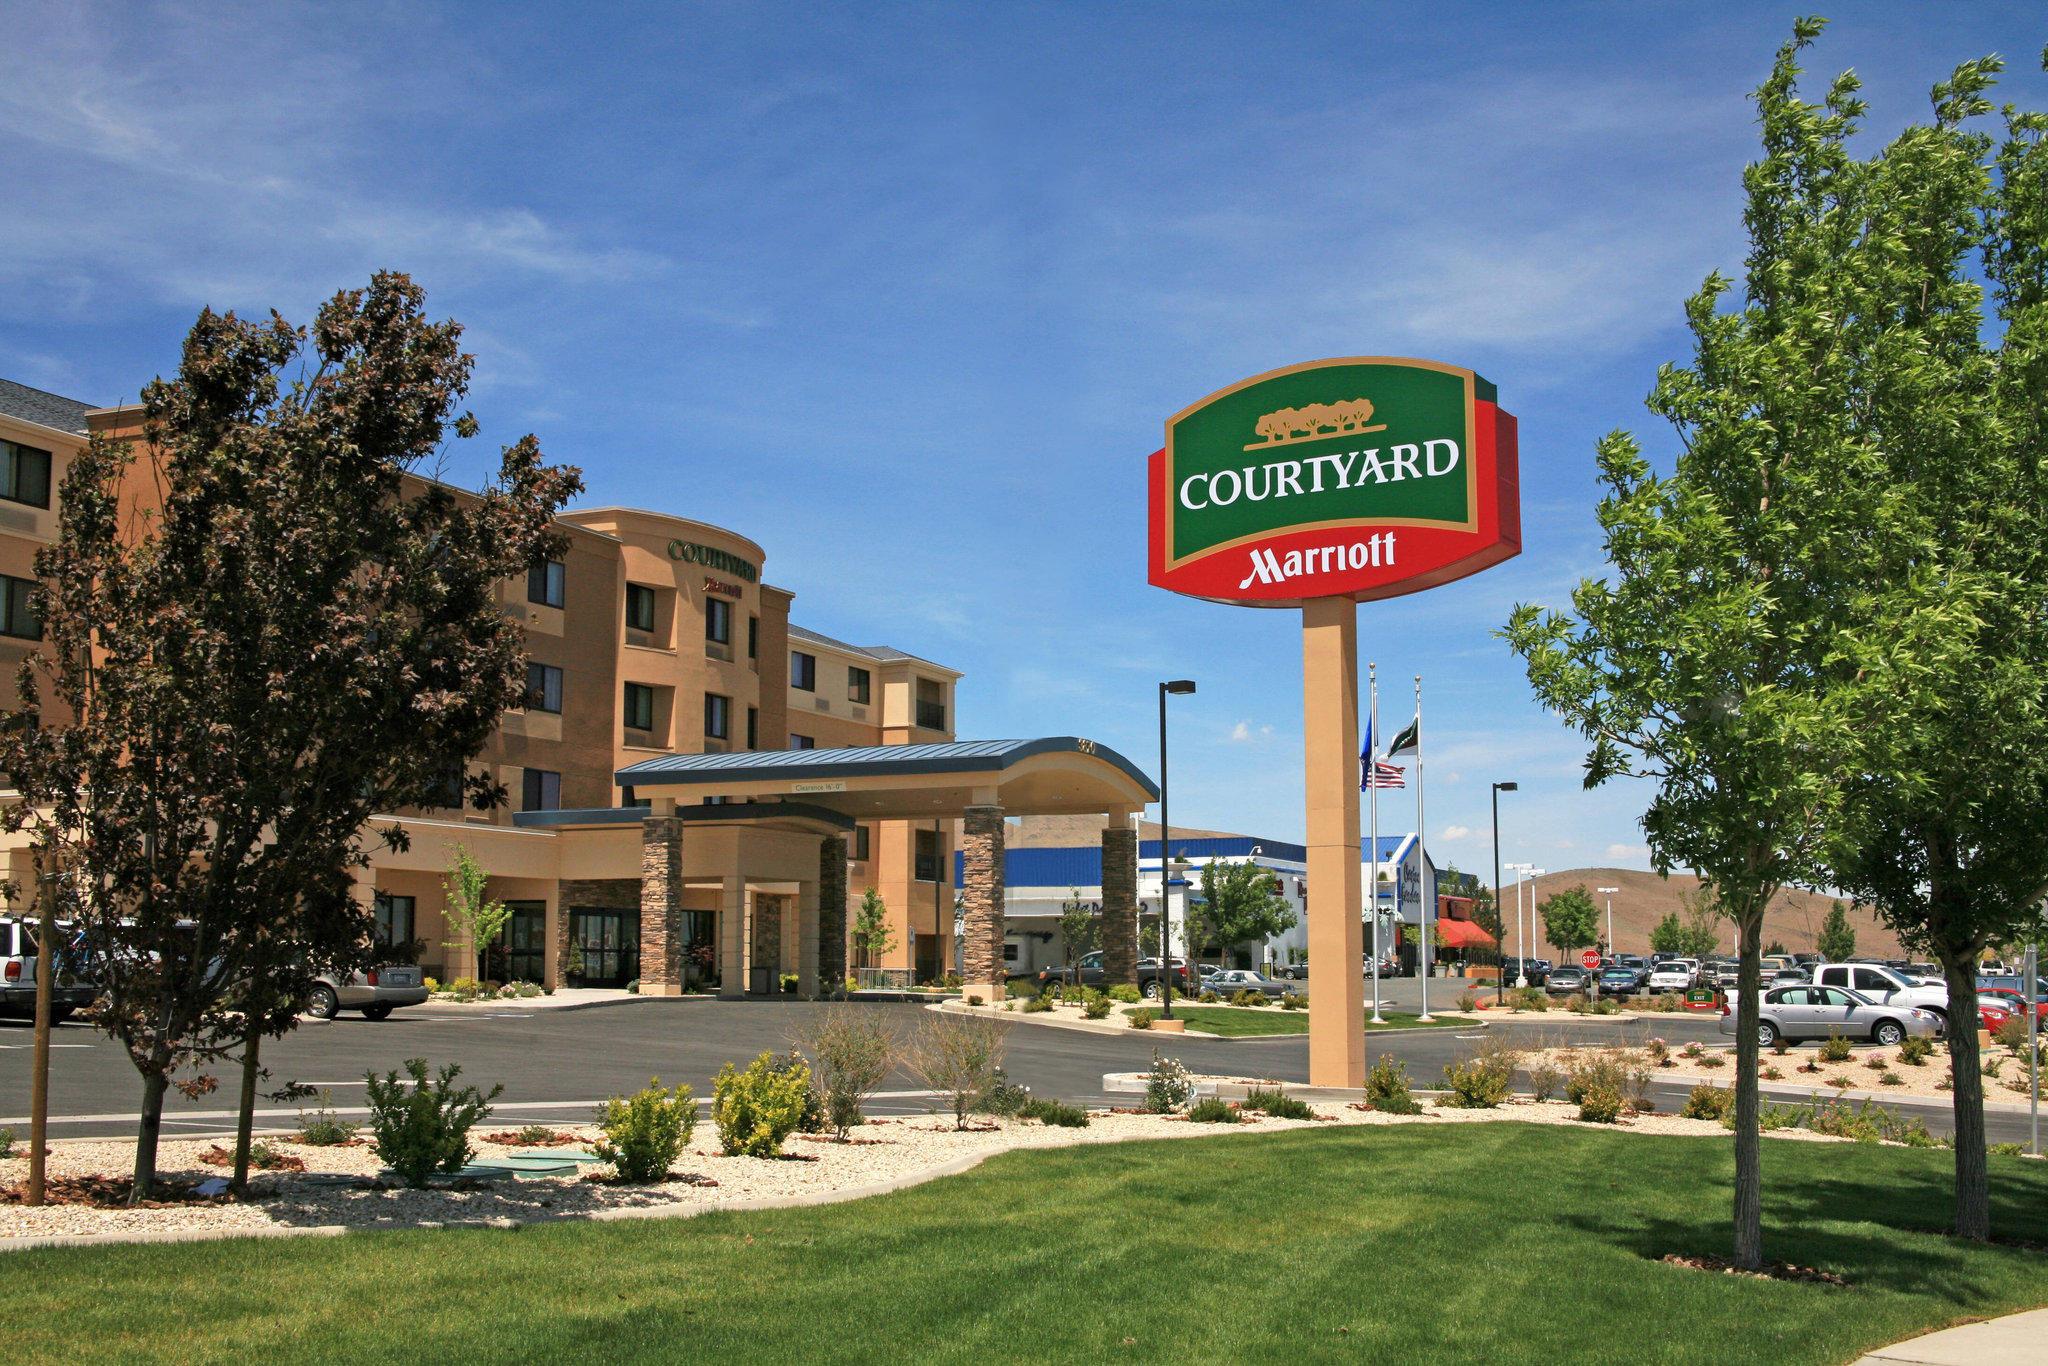 Courtyard by Marriott Carson City